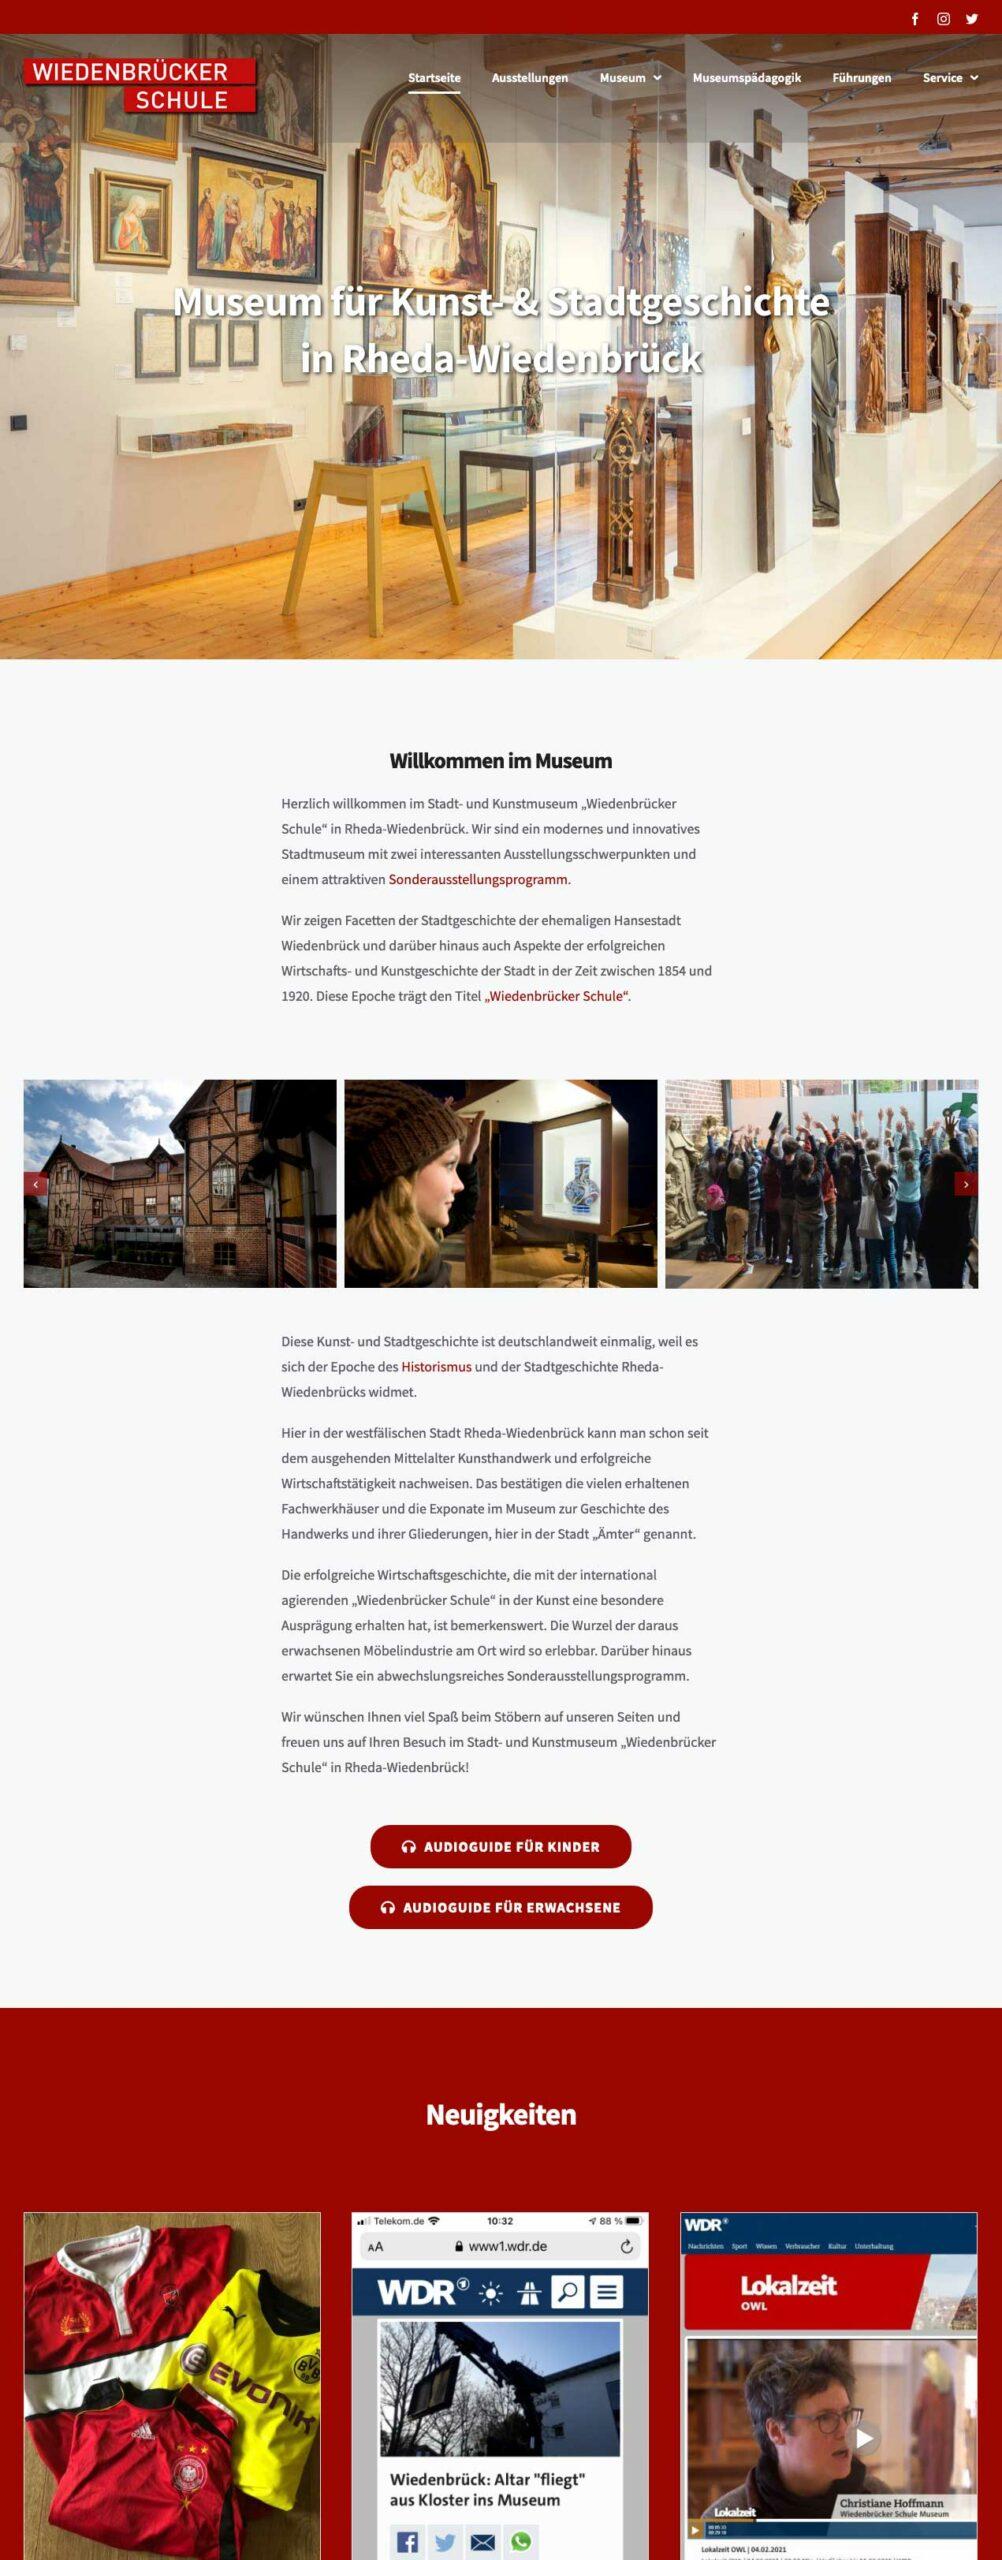 Webseite Wiedenbrücker Schule Museum